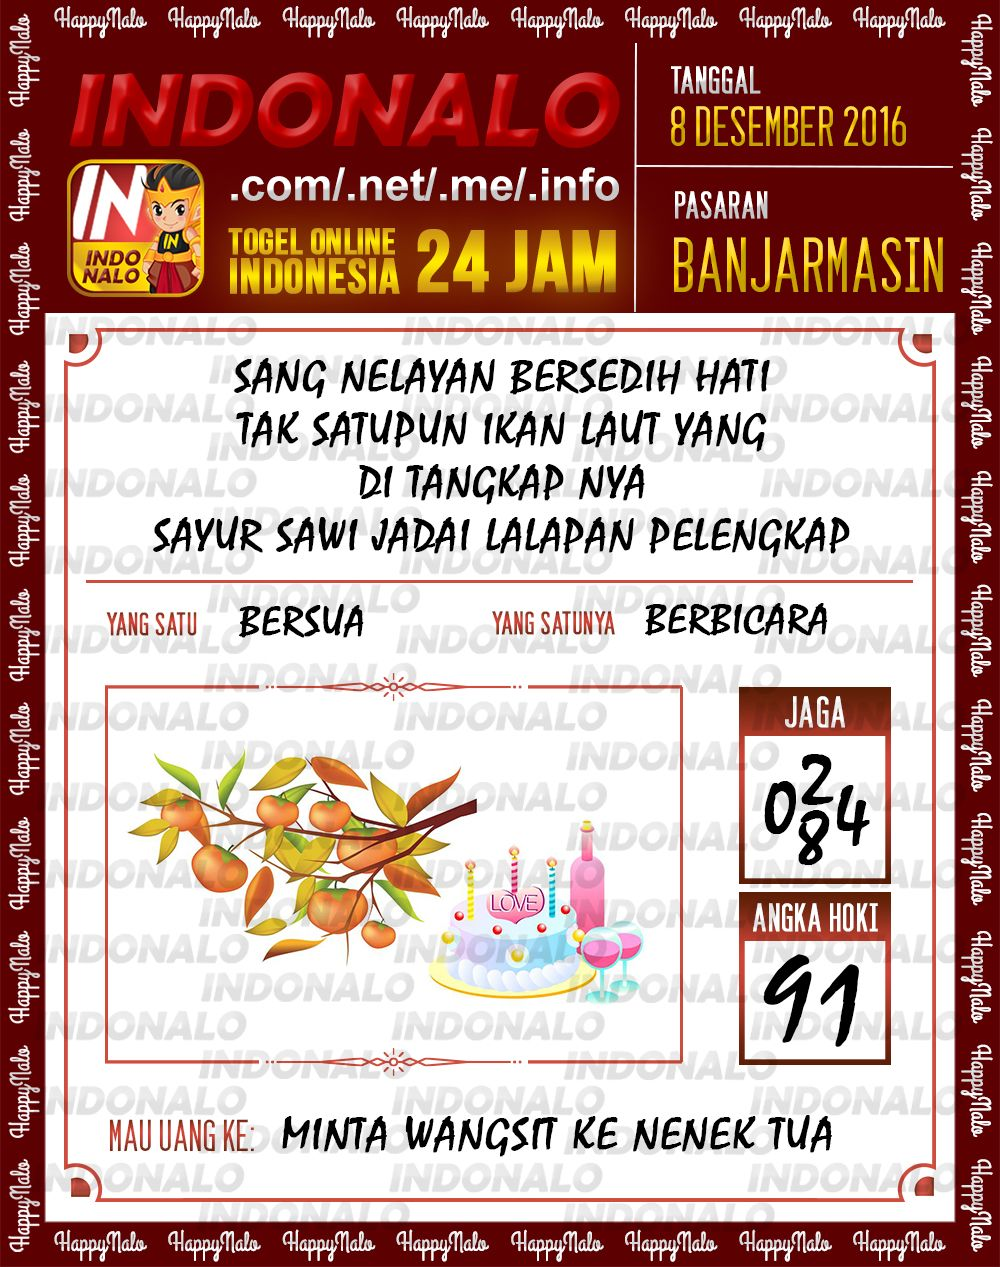 Angka Kumat 4D Togel Wap Online Live Draw 4D Indonalo Banjarmasin 8 Desember 2016